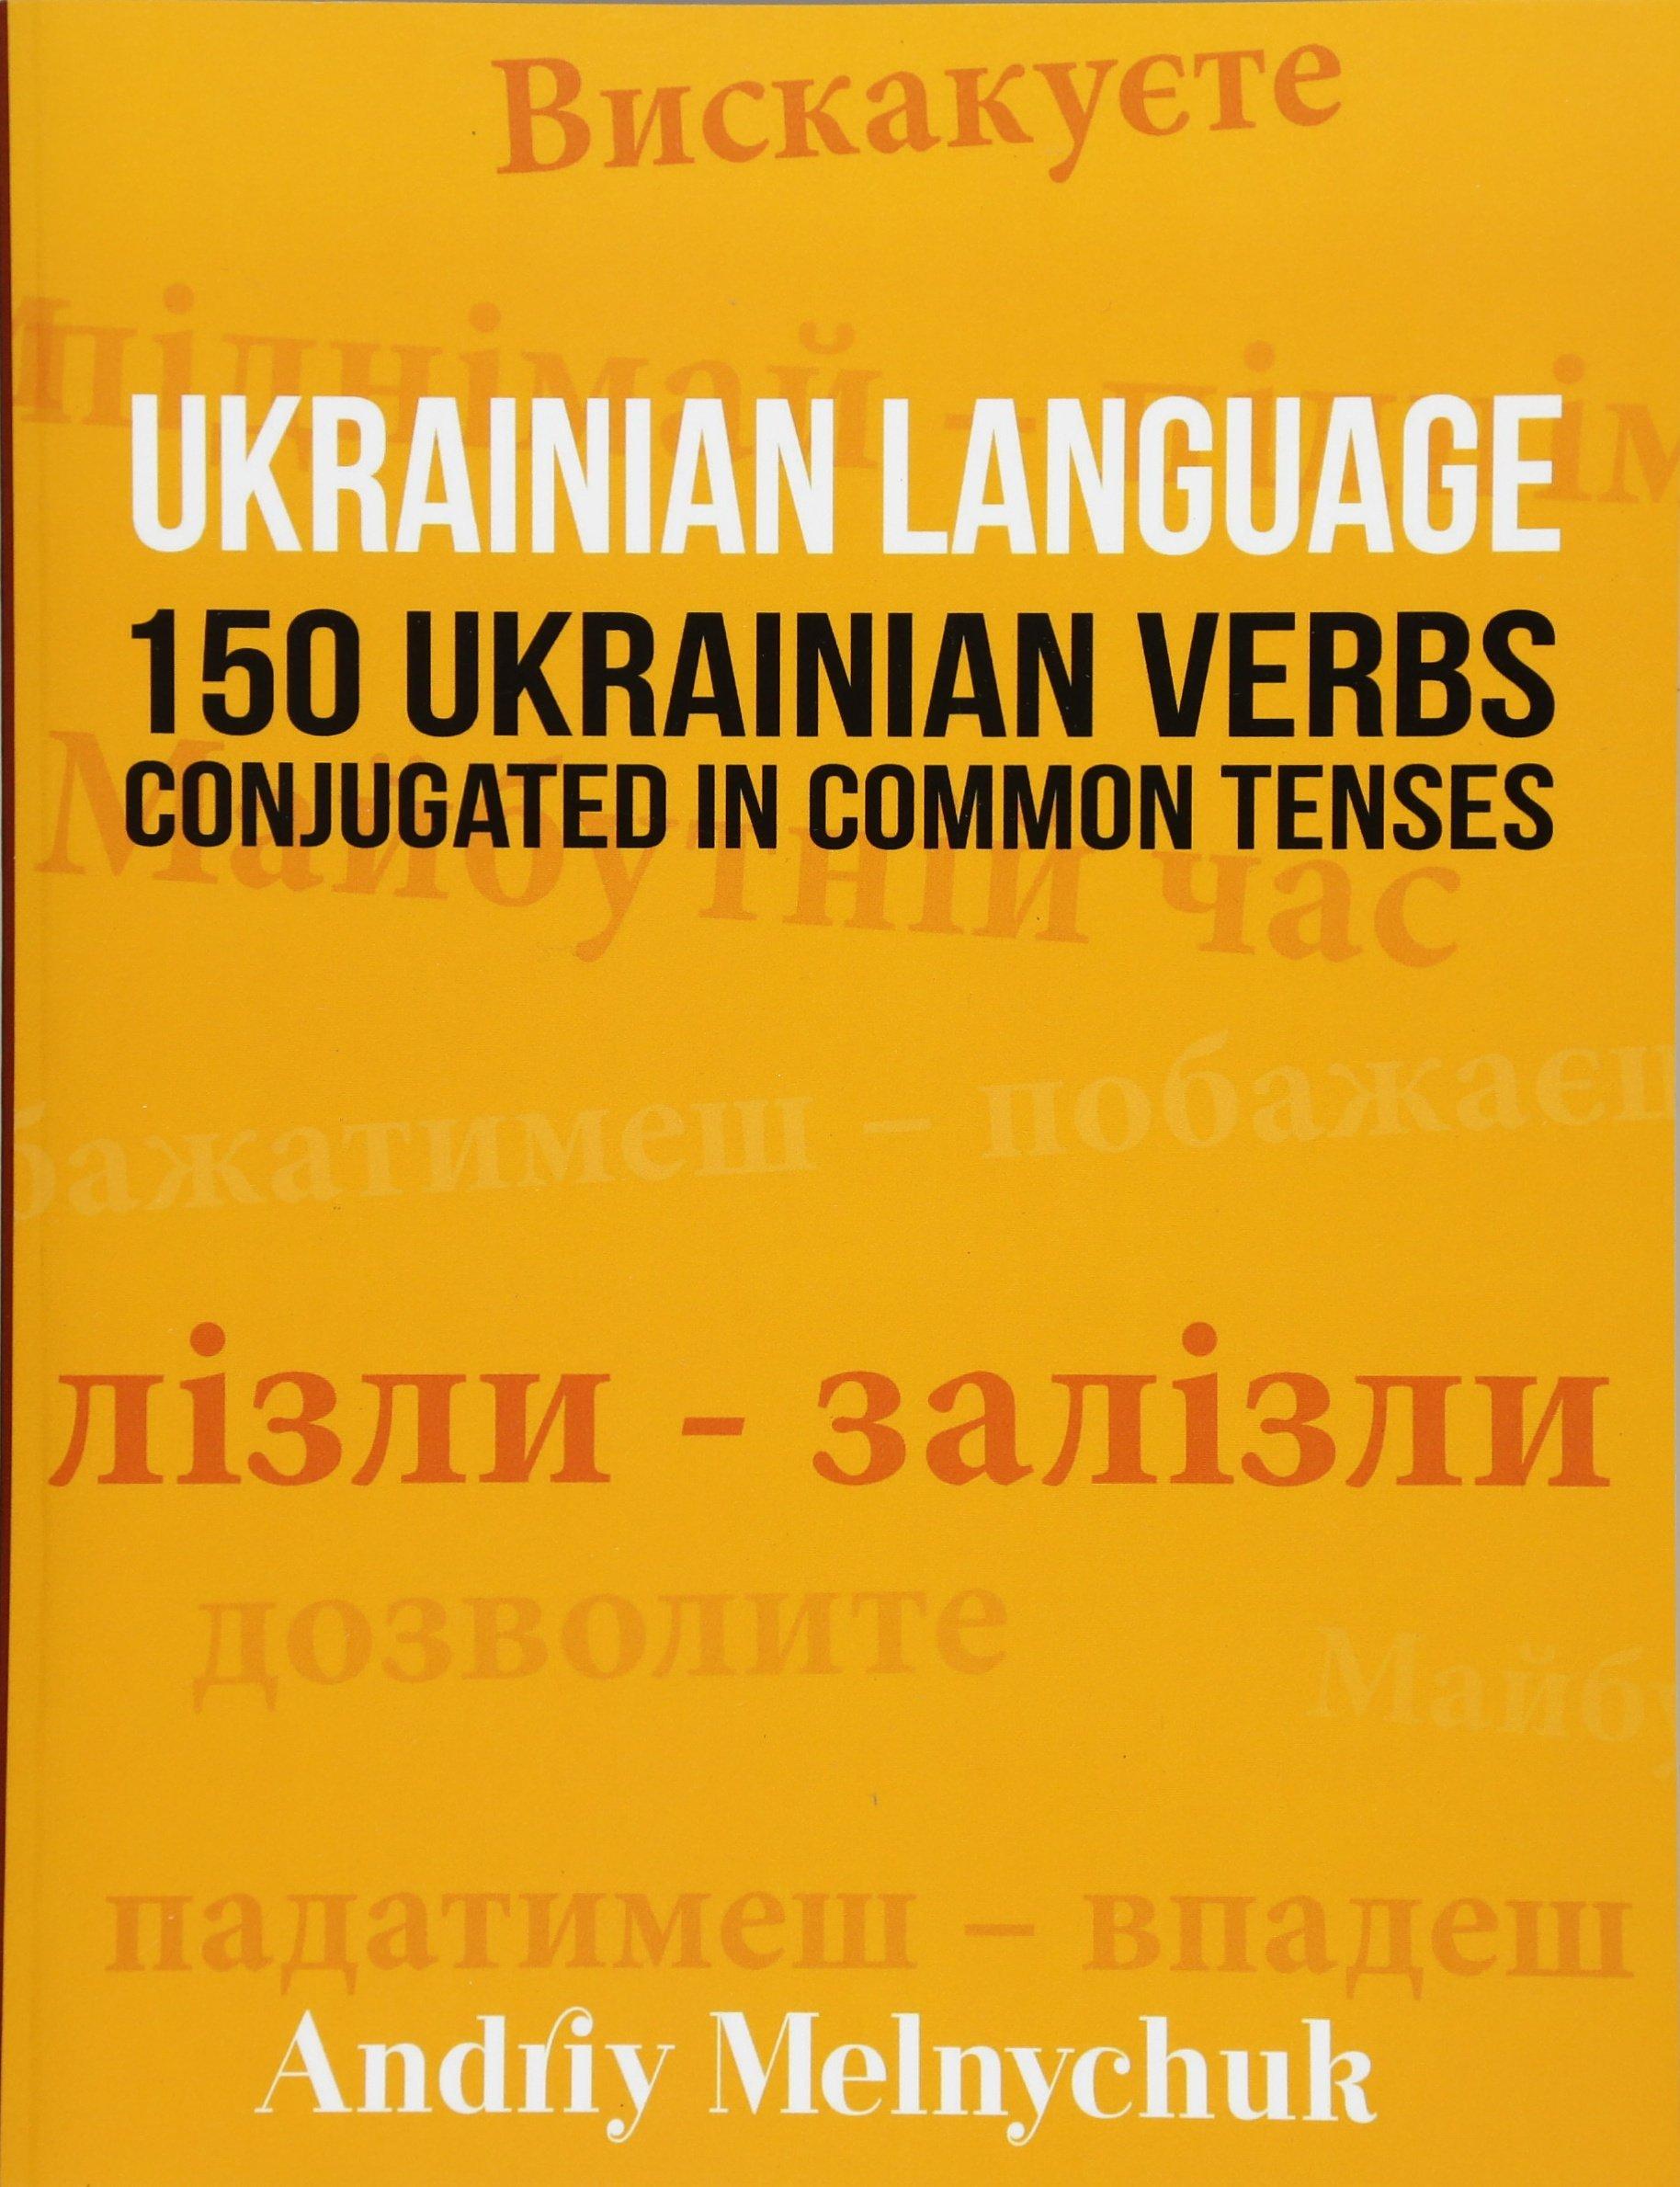 ukrainian-language-150-ukrainian-verbs-conjugated-in-common-tenses